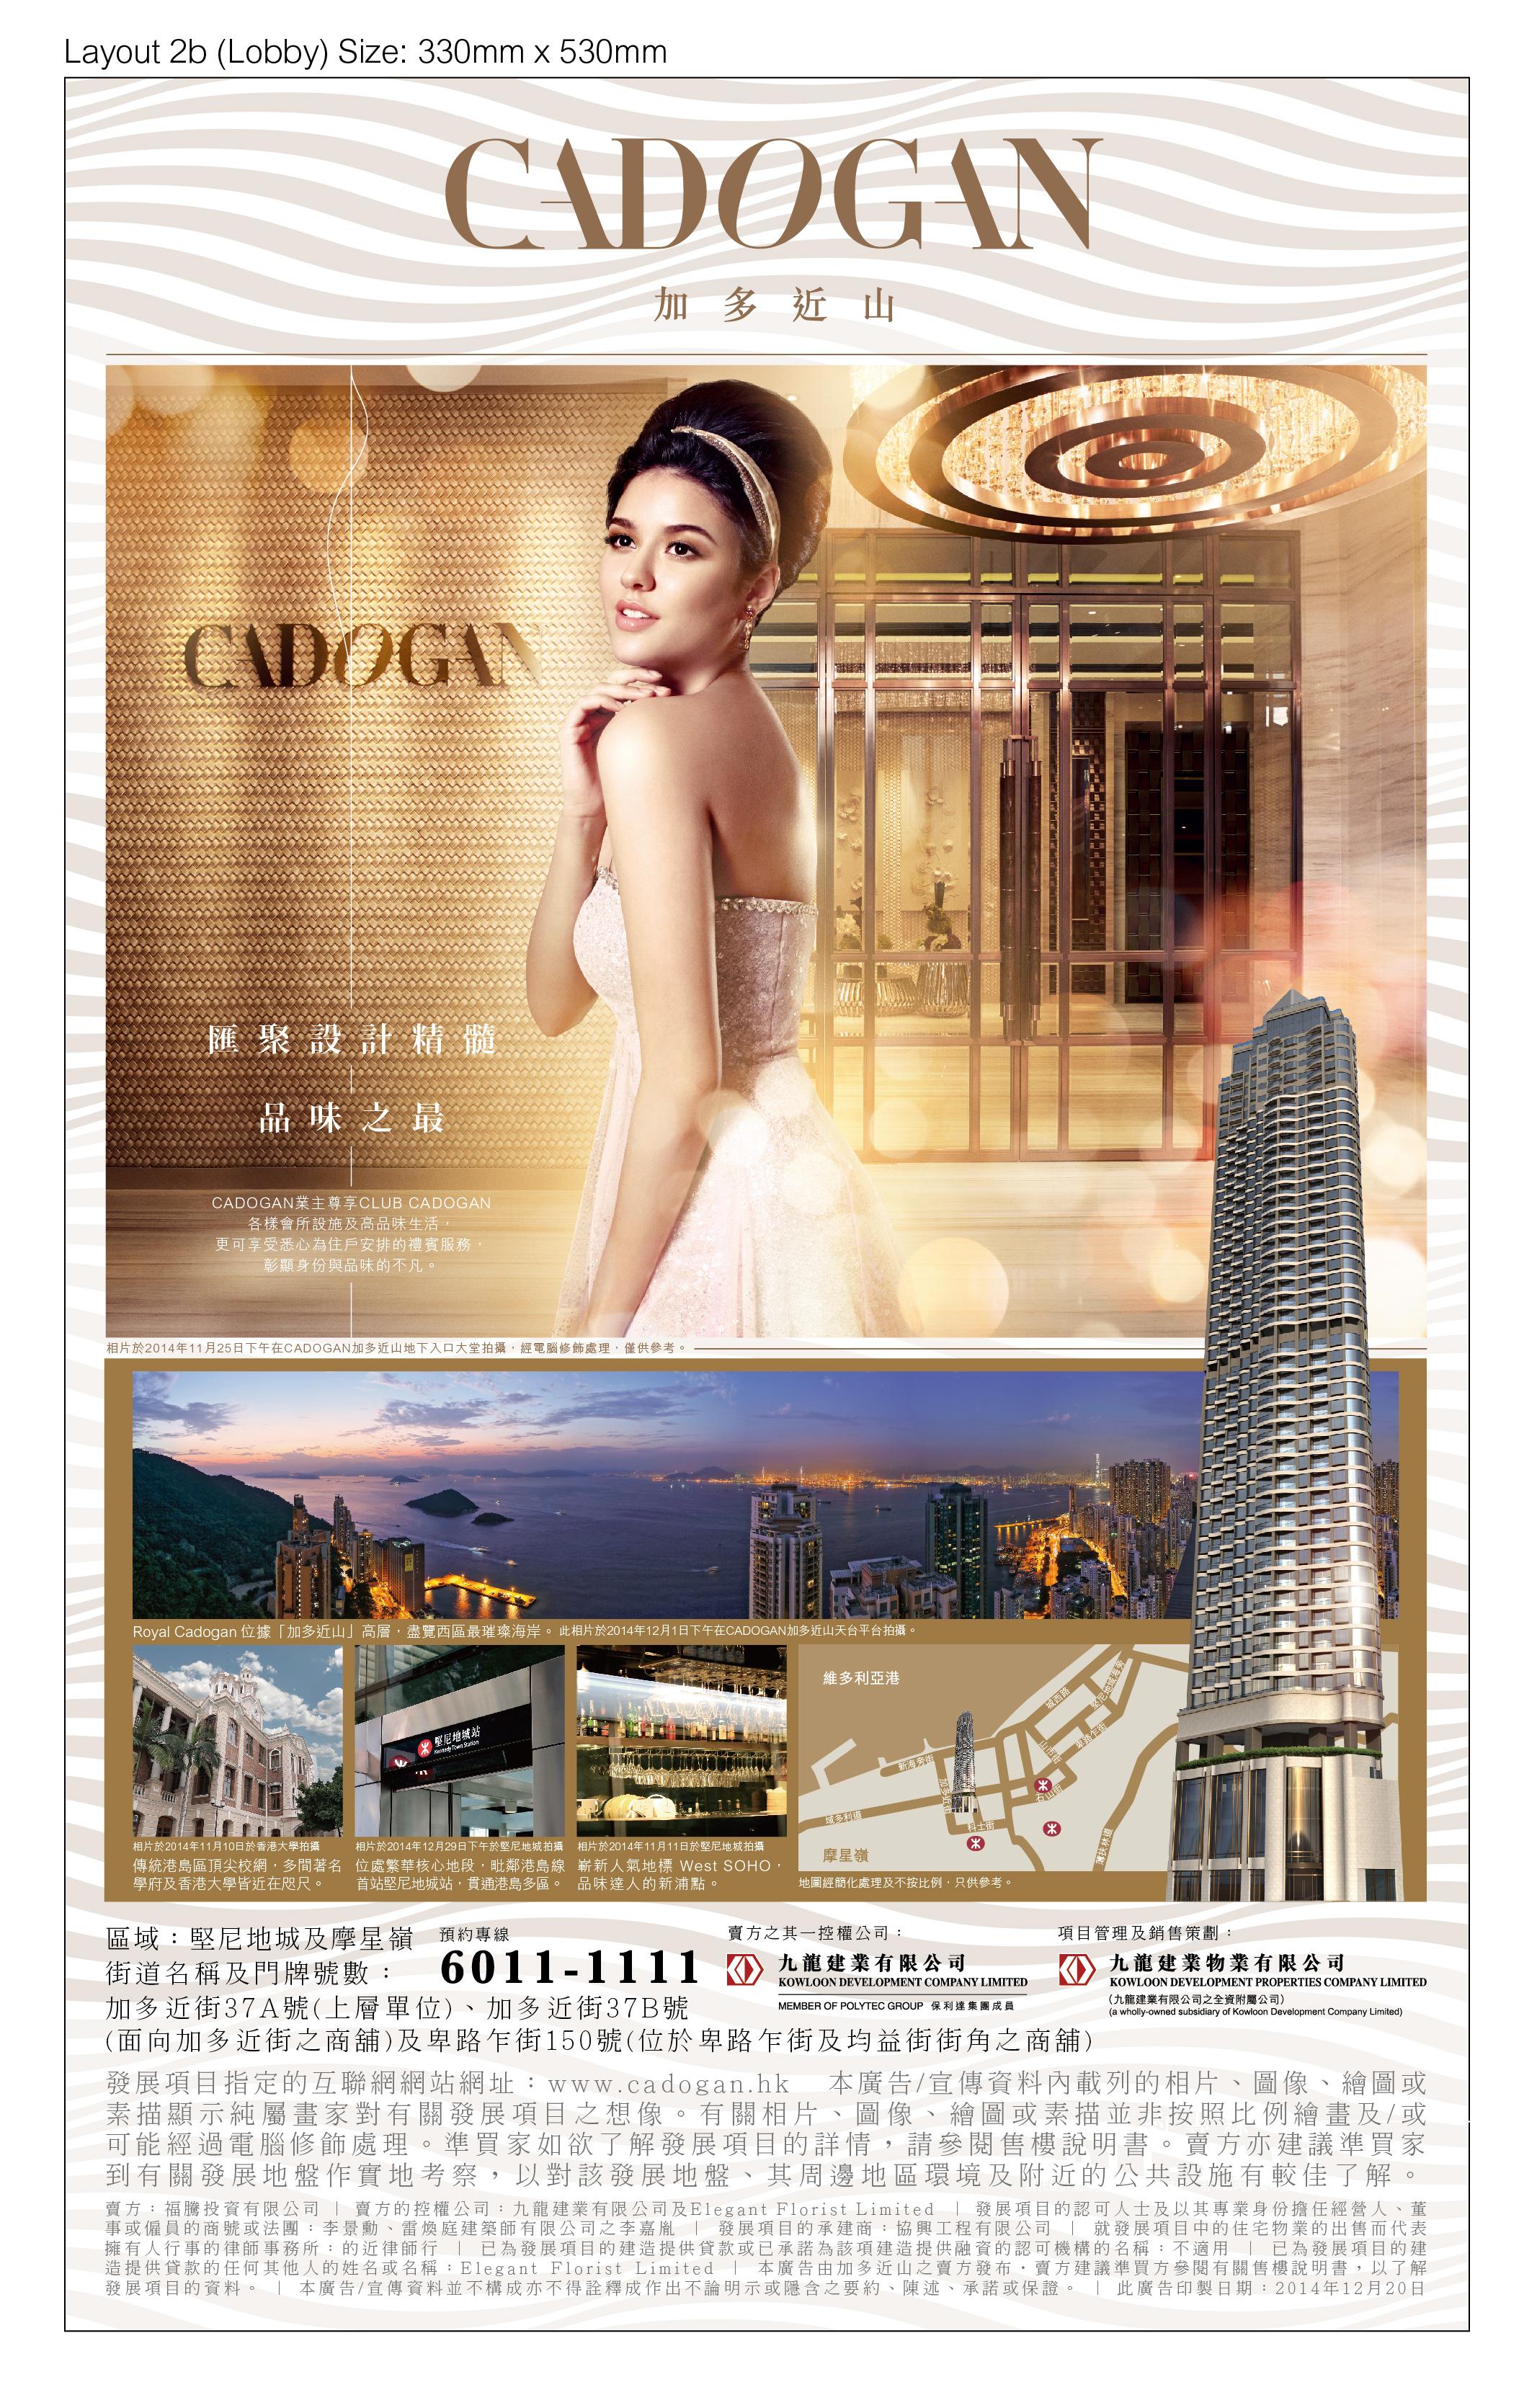 Print Ad-150109-04.jpg